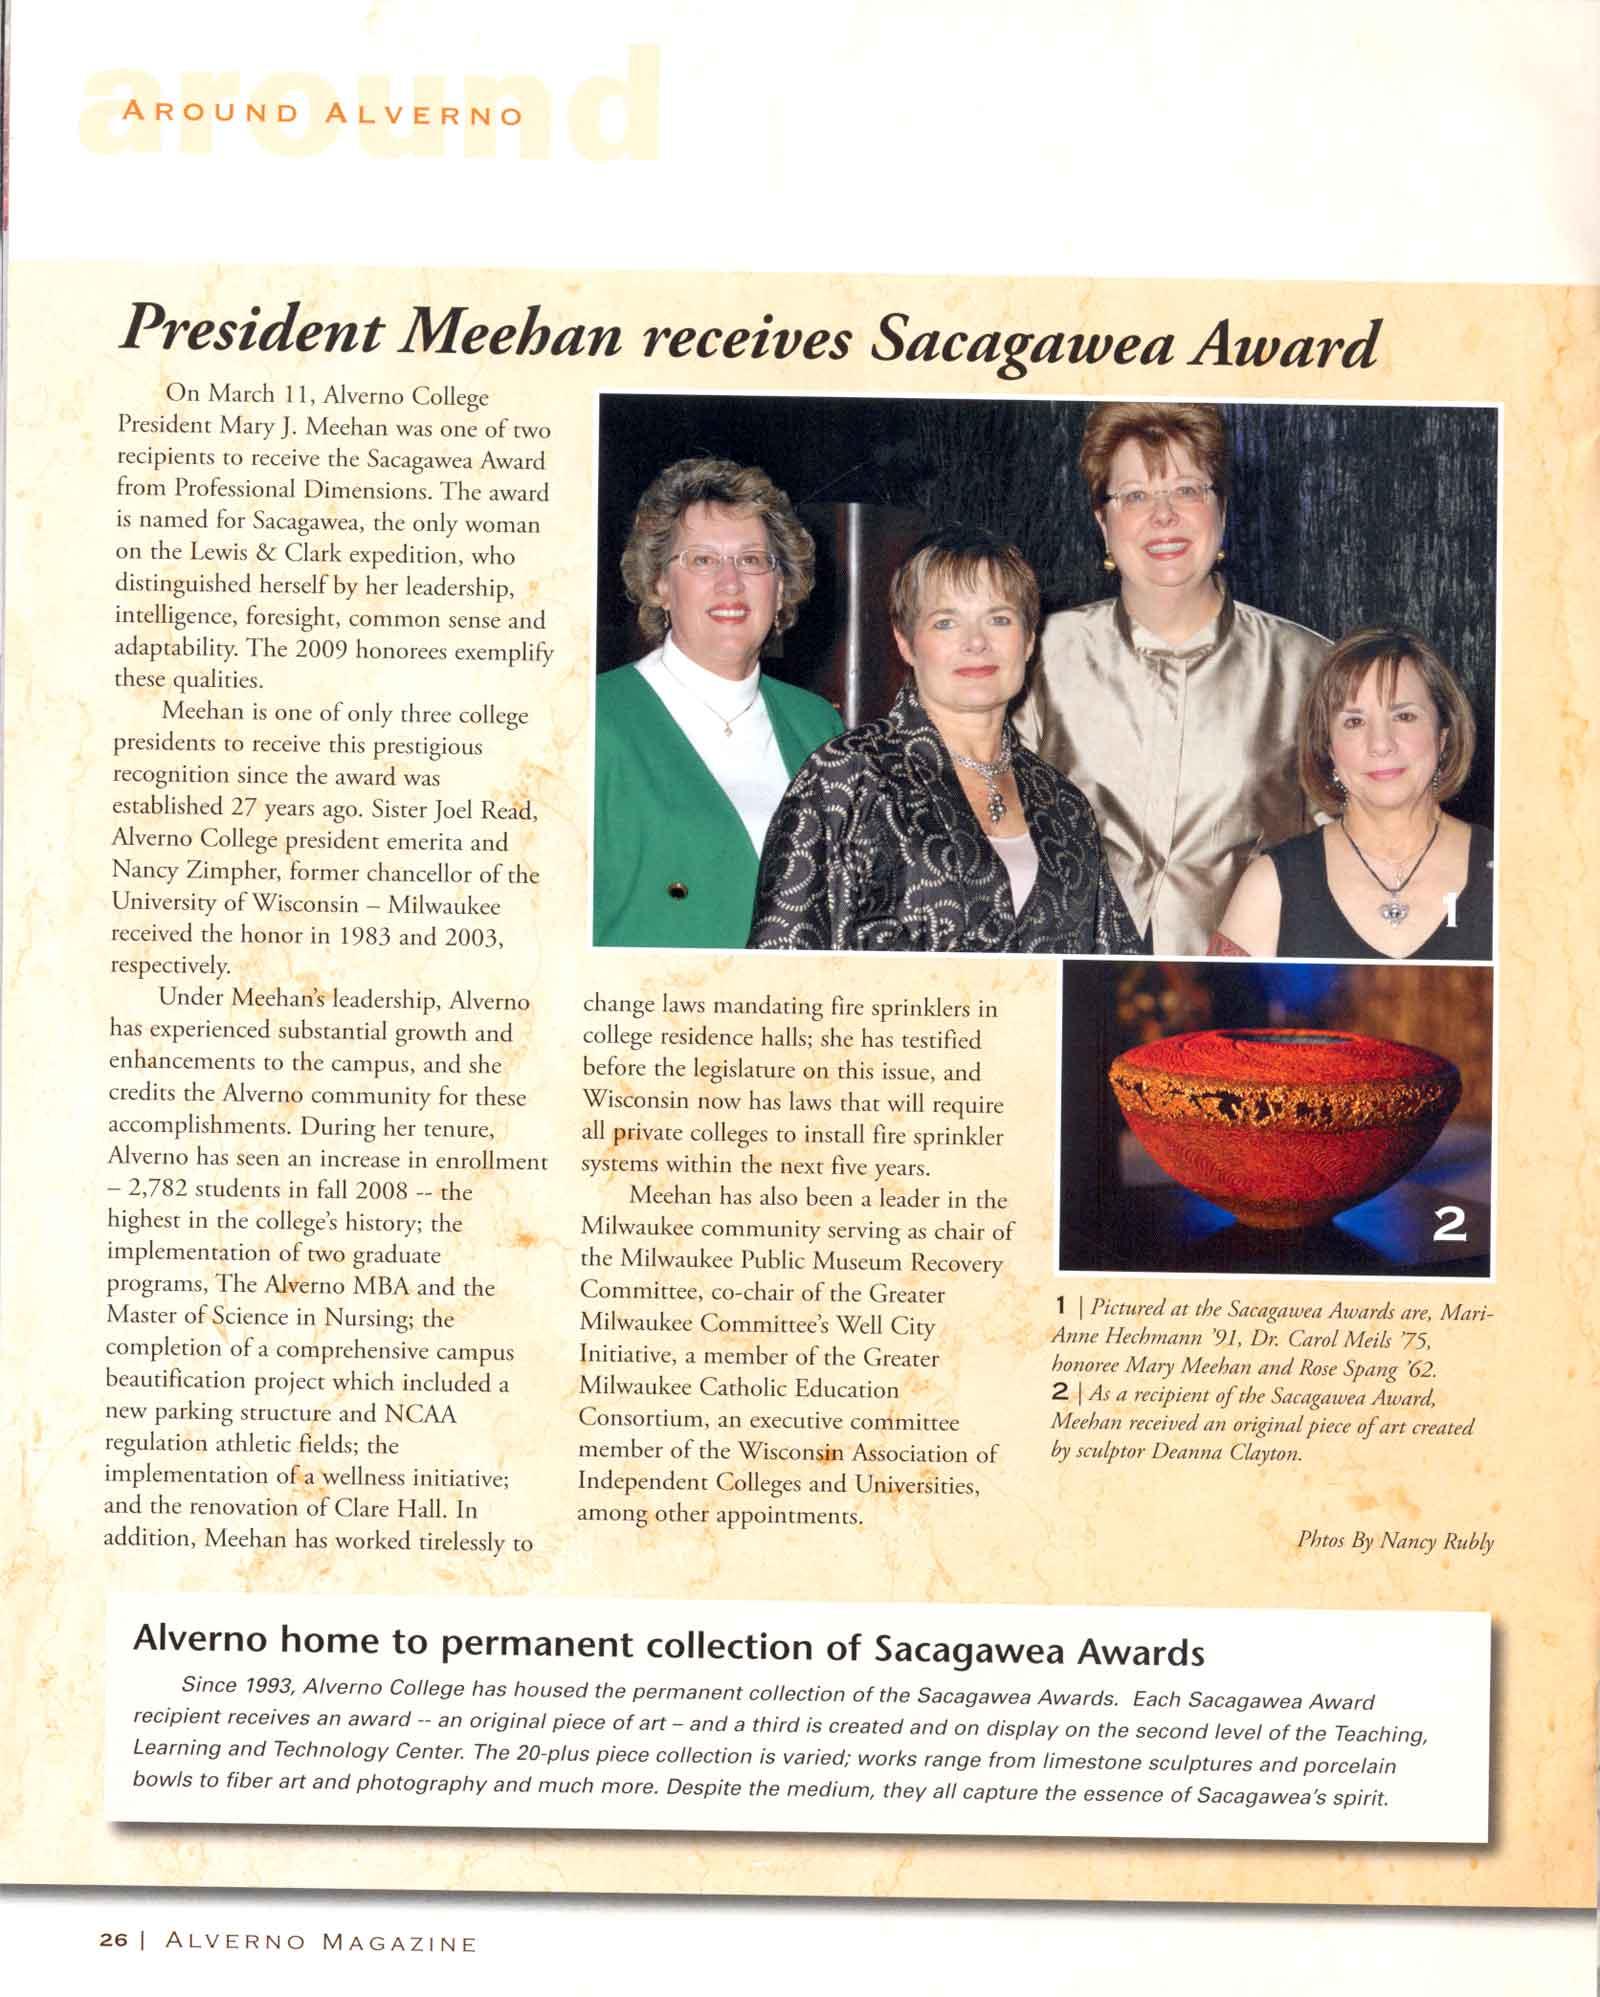 Dr. Mary Meehan recieves Sacagawea Award, Alverno Magazine Spring 2009